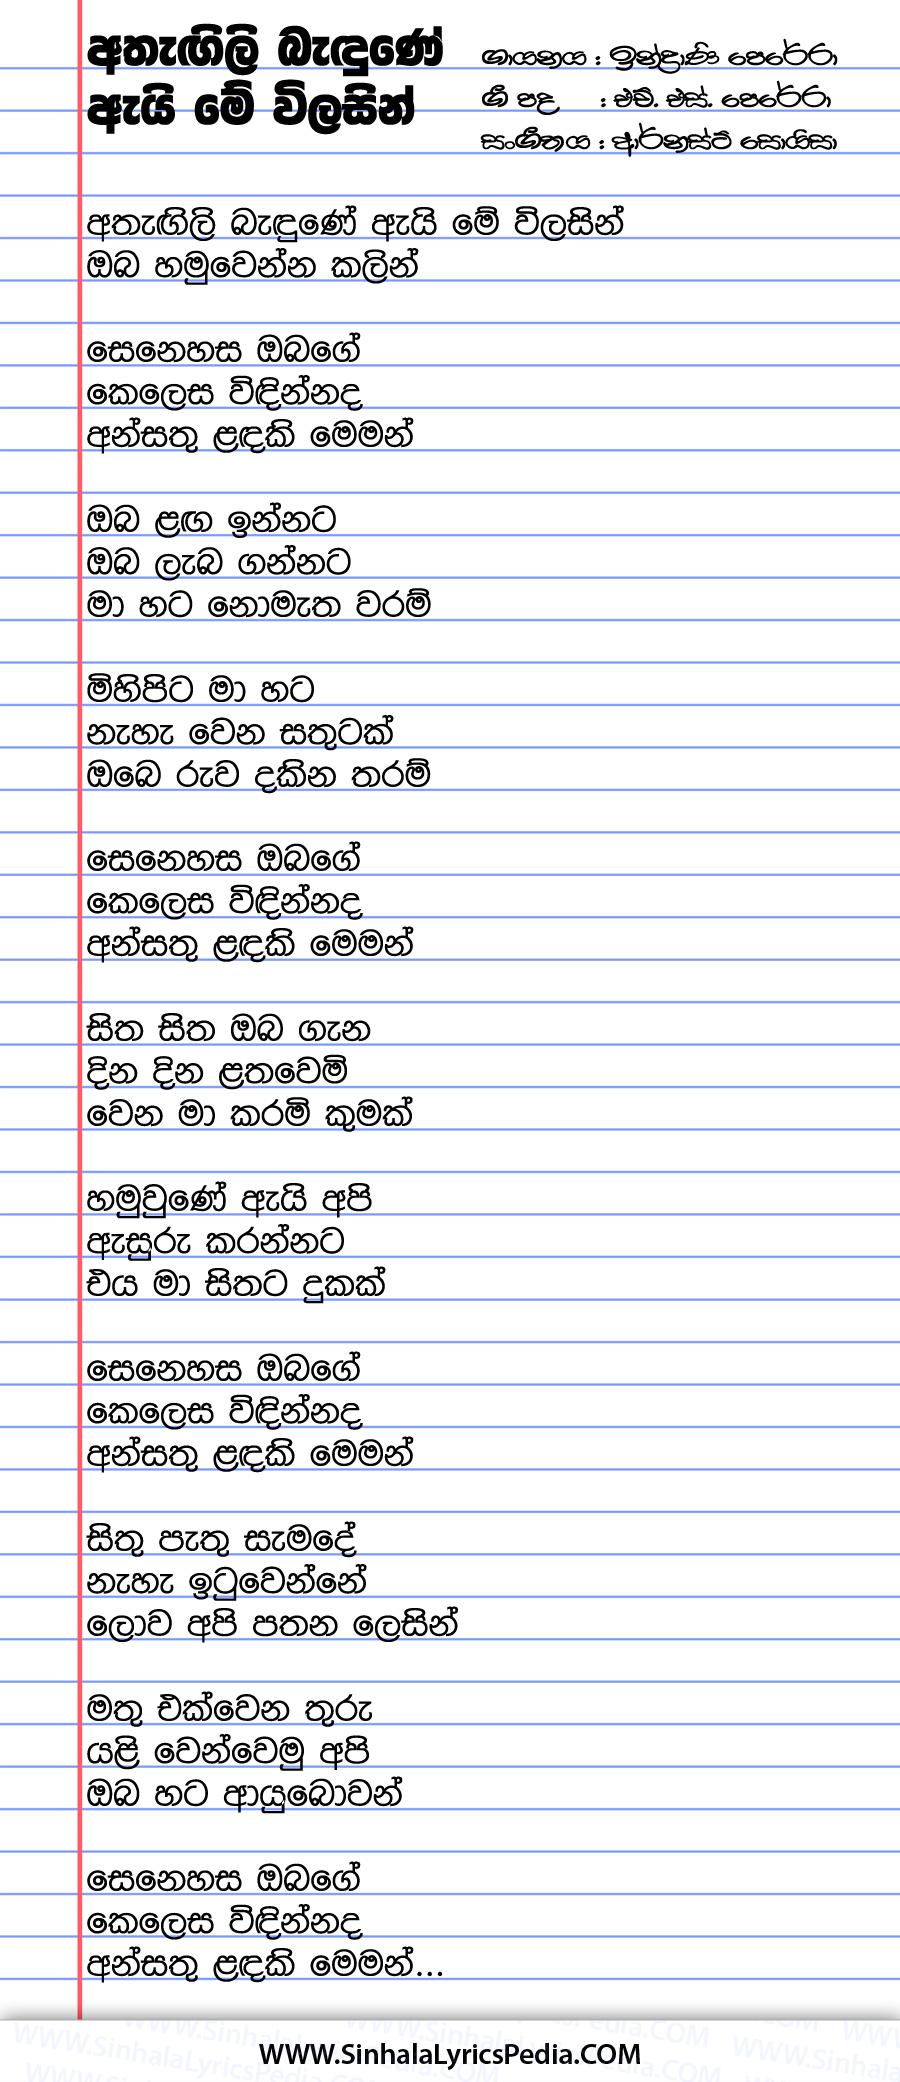 Athagili Badune Ai Me Wilasin Song Lyrics